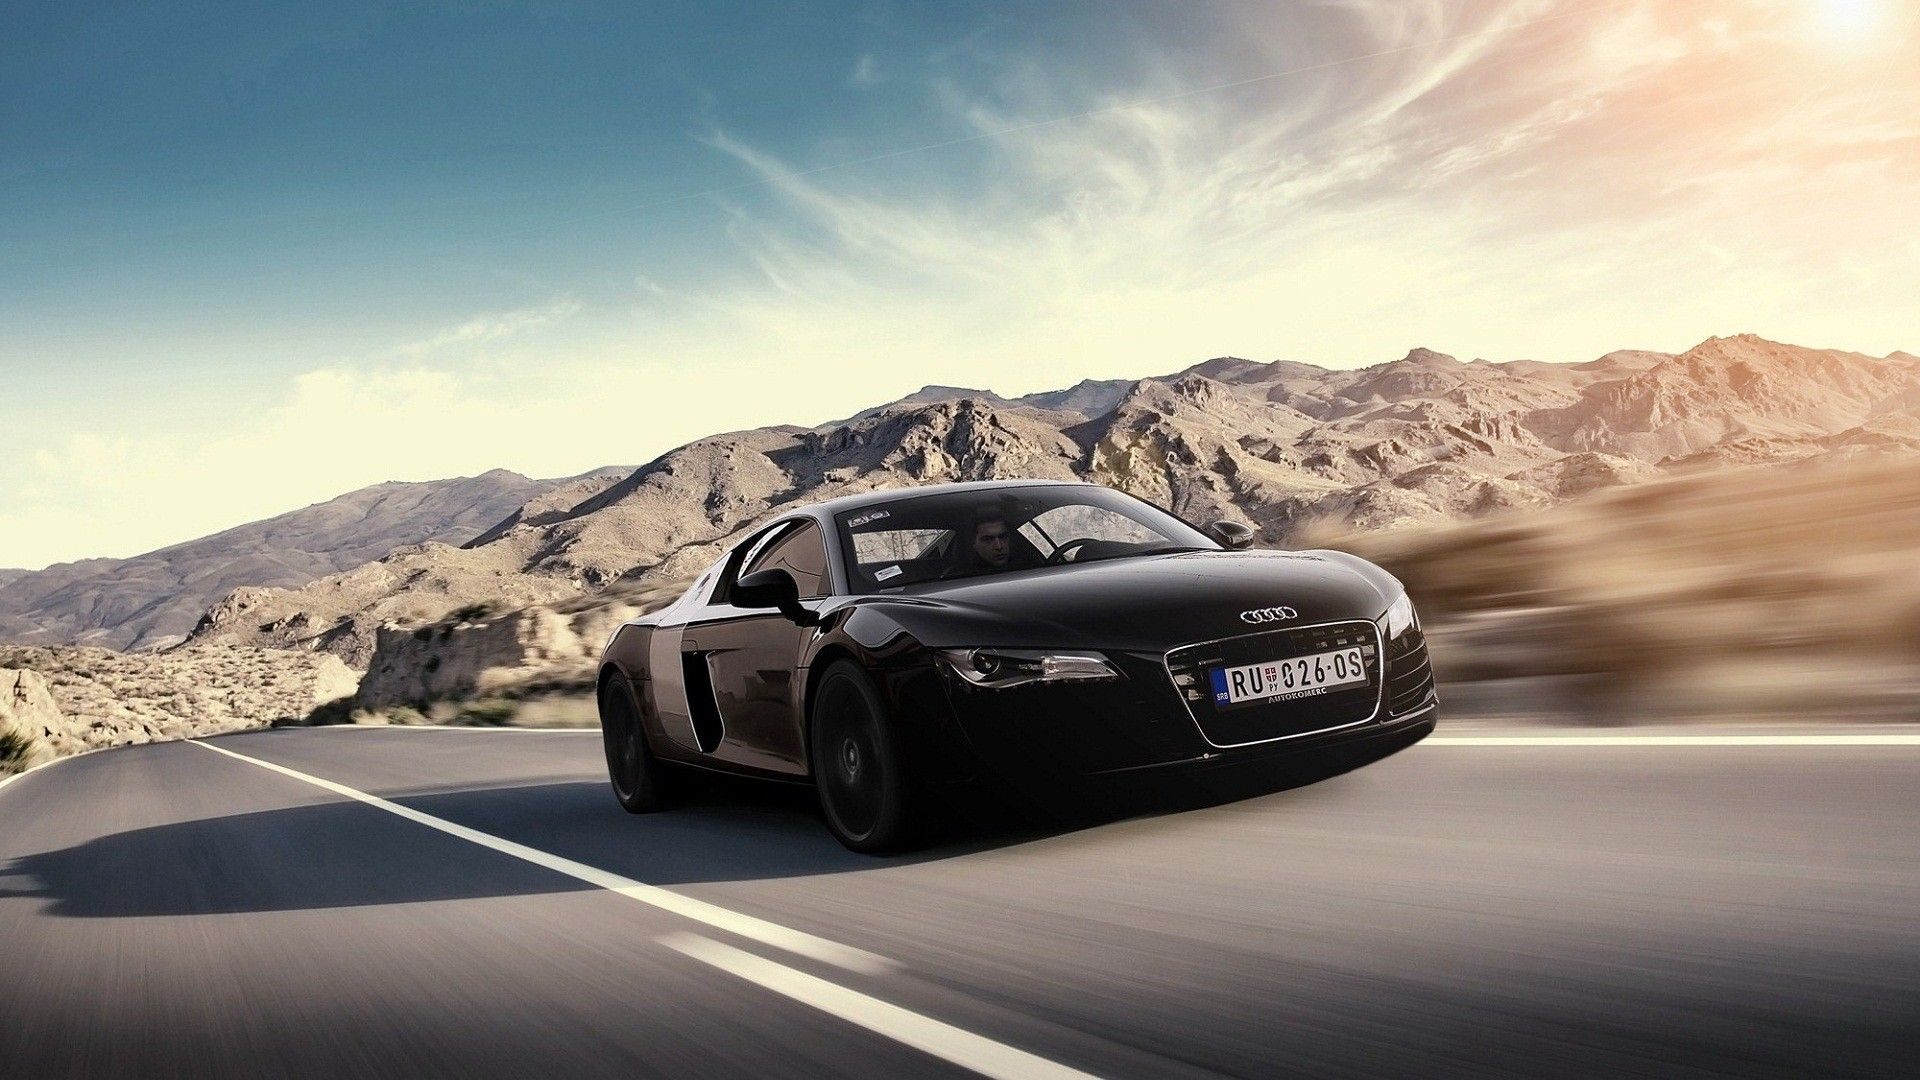 Black Audi R8 Wallpapers Top Free Black Audi R8 Backgrounds